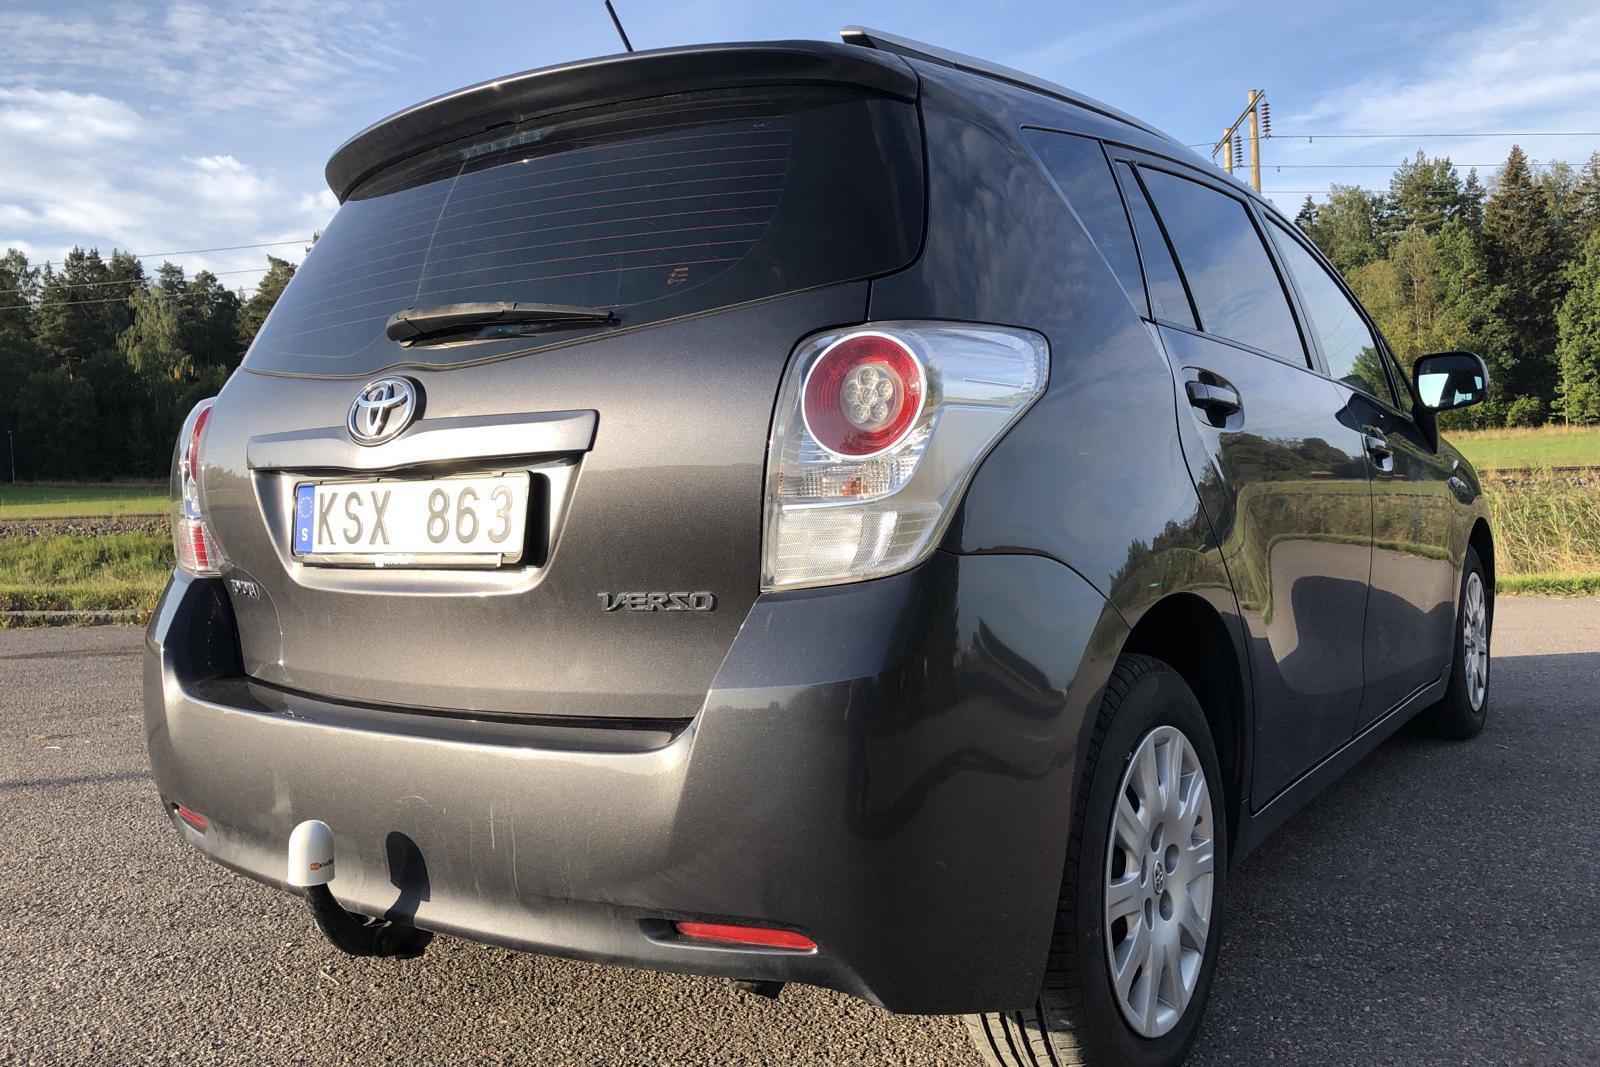 Toyota Verso 1.8 (147hk) - 194 600 km - Manual - Dark Grey - 2010